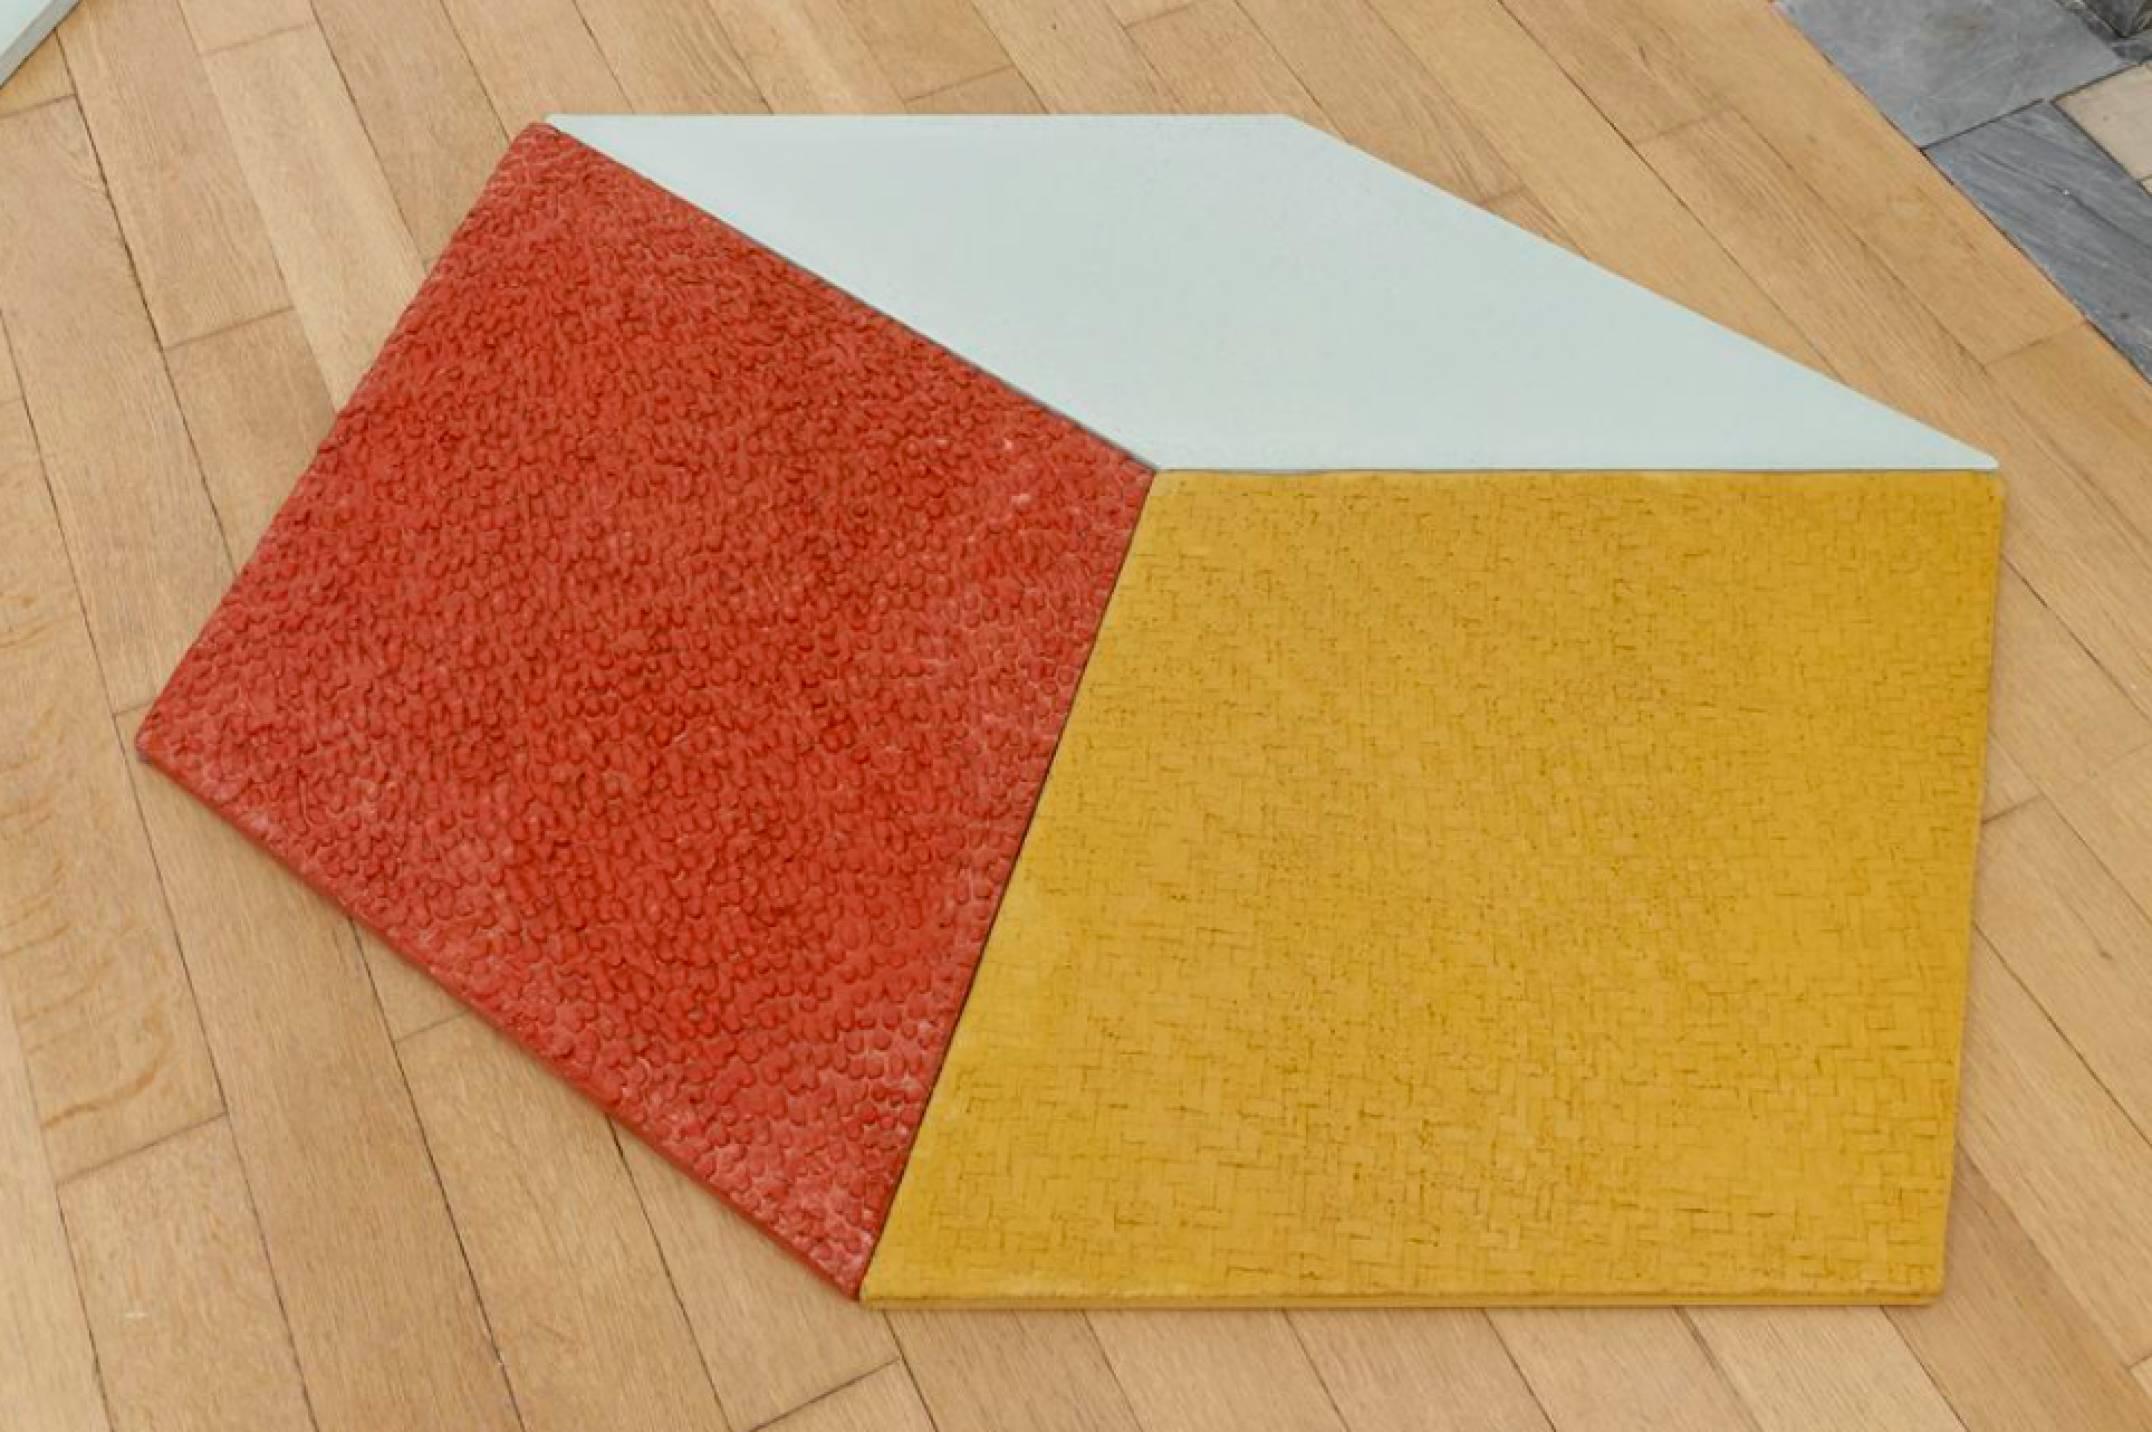 Mariana Castillo Deball, <em>Petate, Xipe, Turquesa</em>, 2017, colored concrete tiles with relief, 97 × 114 cm - Mendes Wood DM